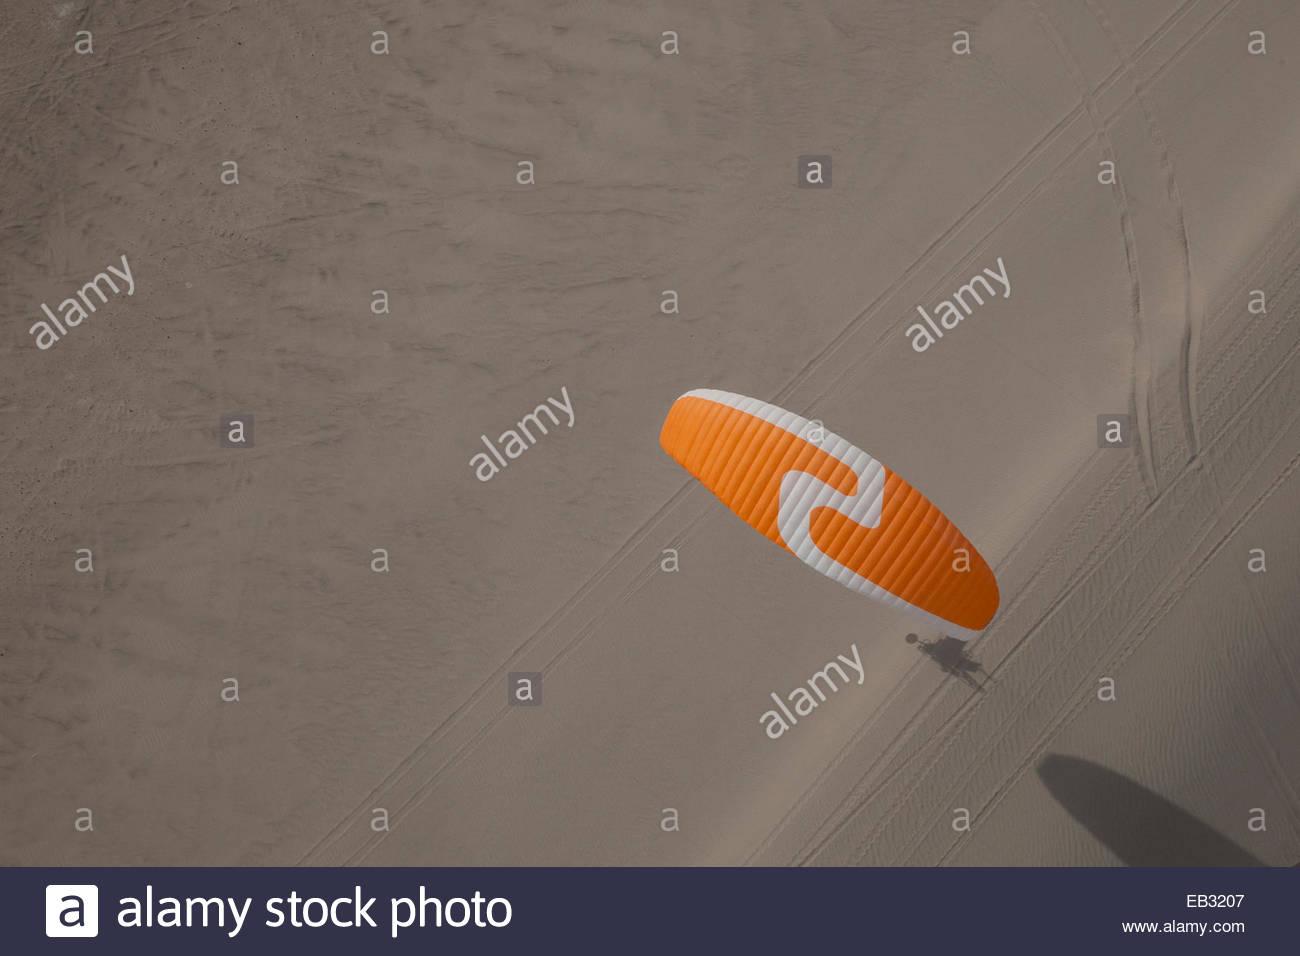 Flying a motorized paraglider over sand dunes in the Mojave Desert near Dumont Dunes. - Stock Image